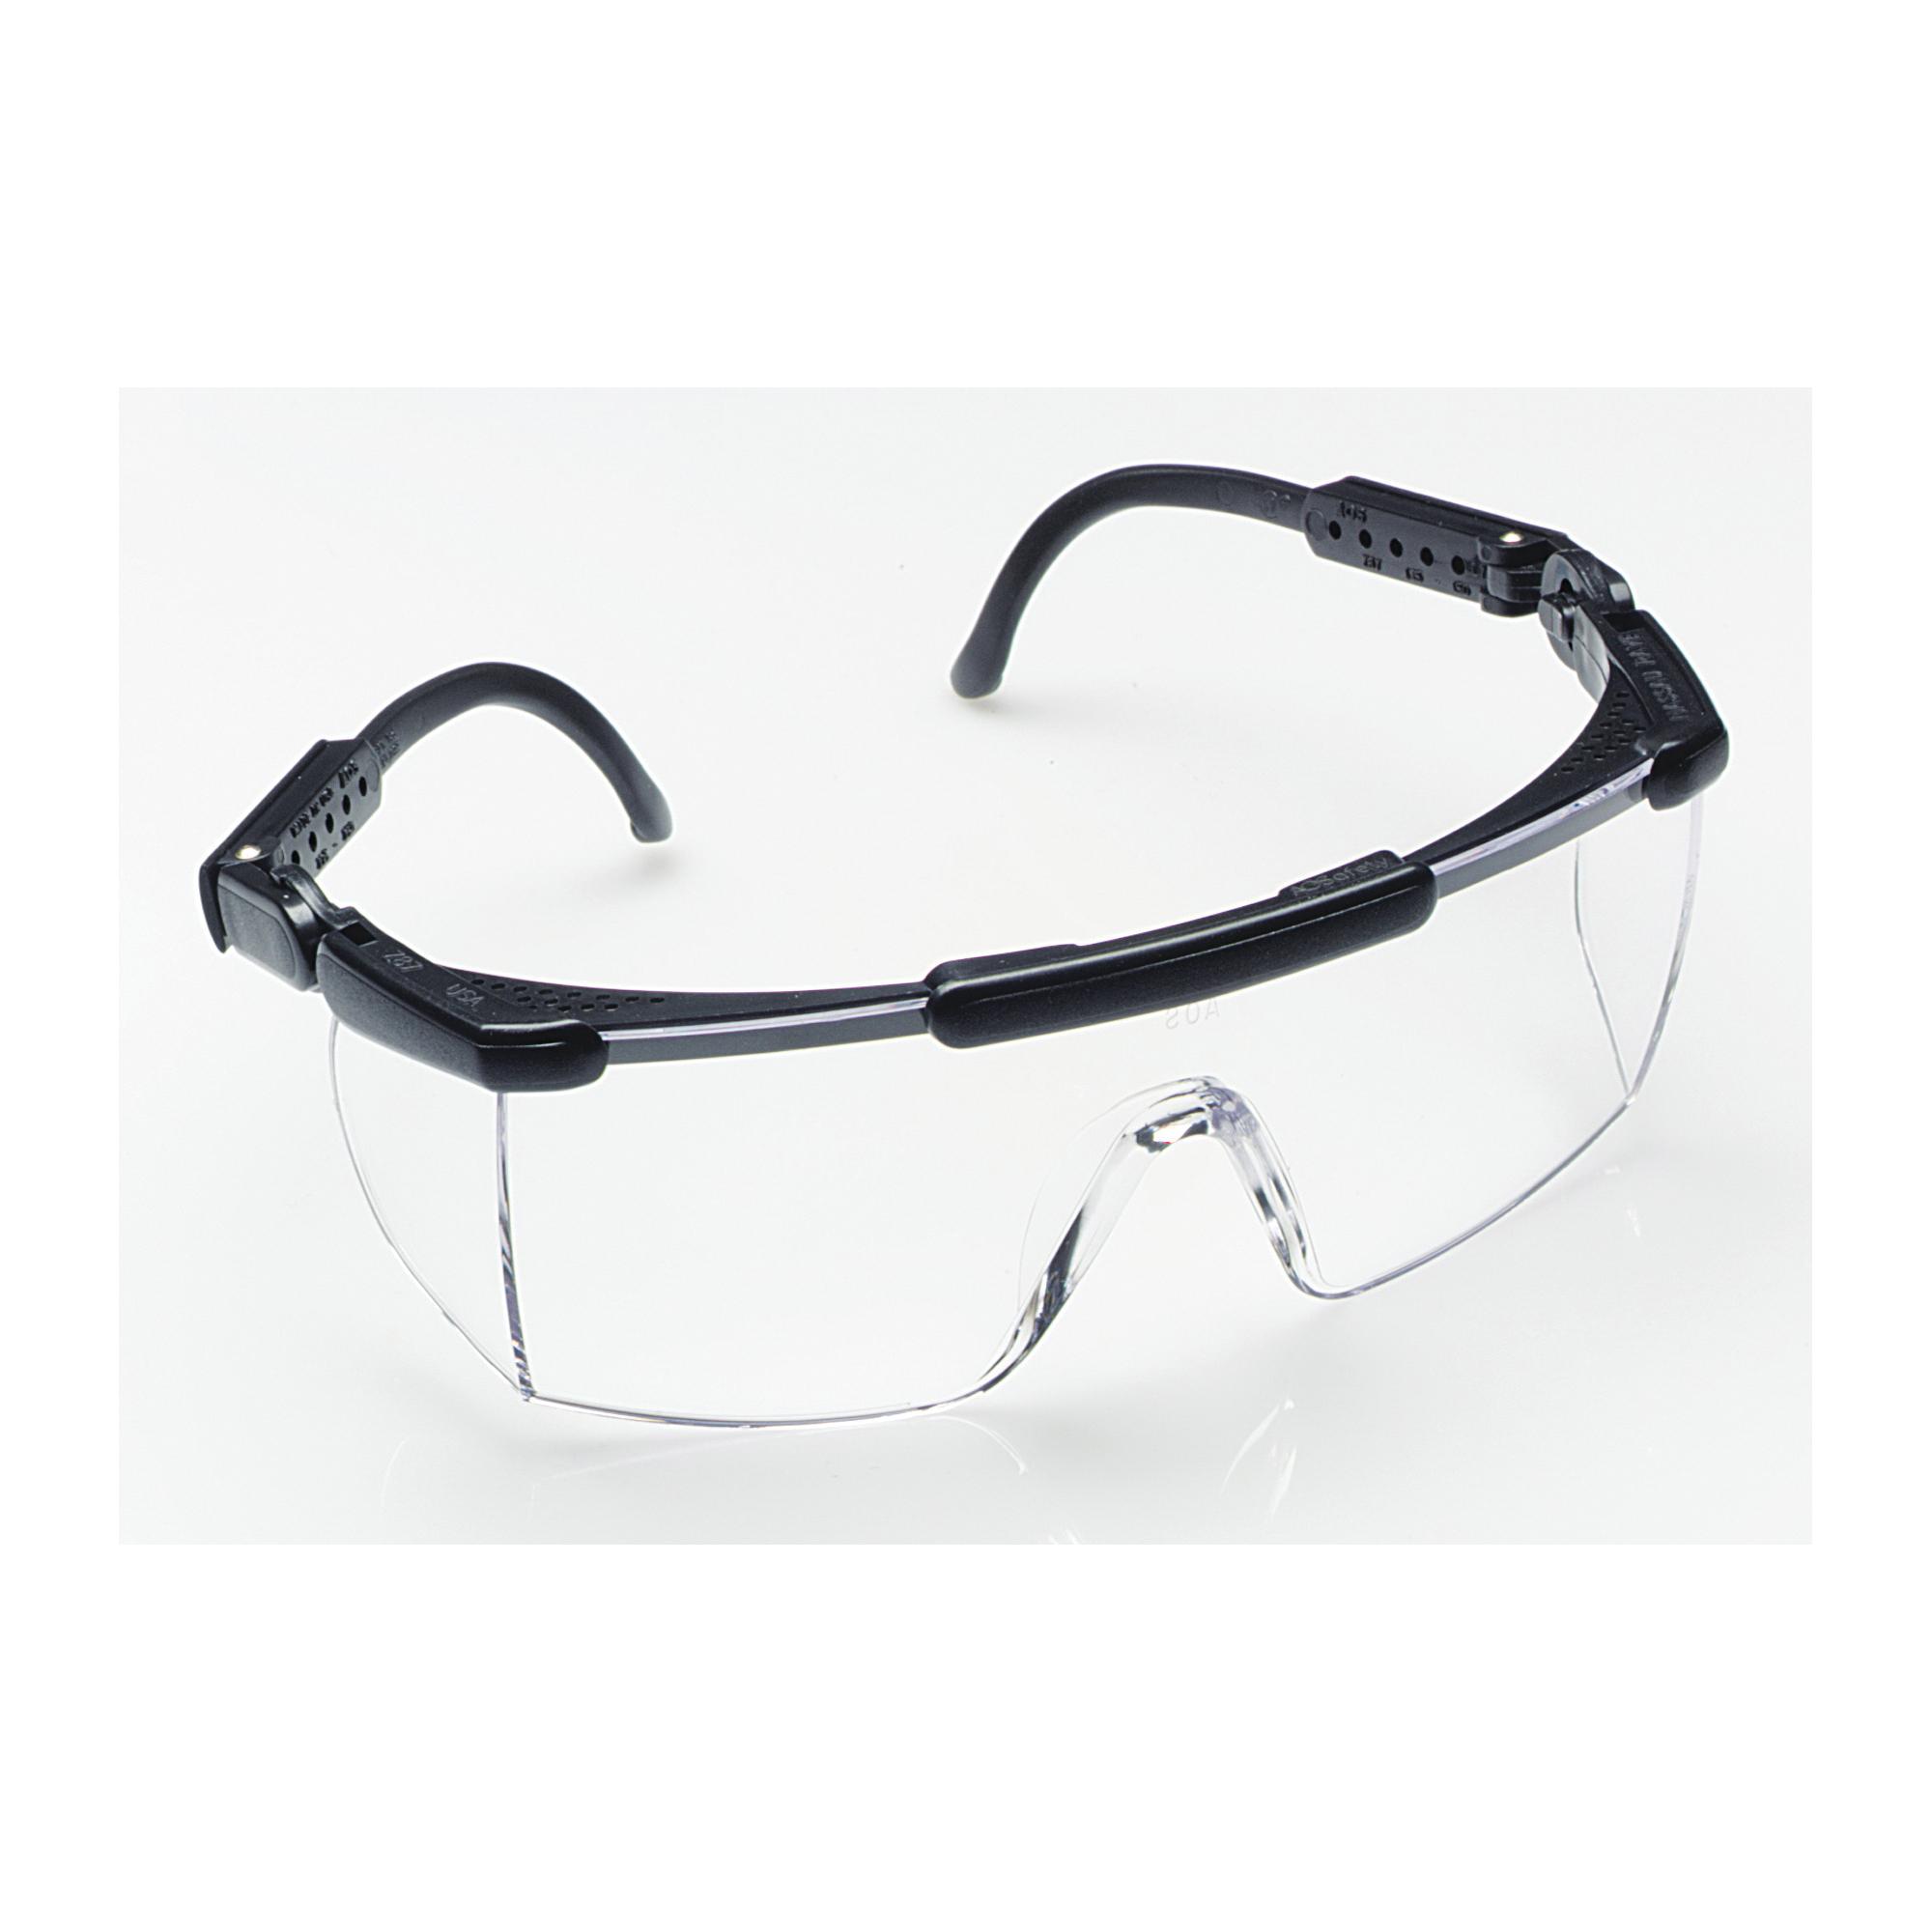 3M™ Nassau Rave™ 078371-62271 Lightweight Protective Eyewear, DX™ Anti-Fog/Anti-Scratch, Clear Lens, Half Framed Frame, Black, Plastic Frame, Polycarbonate Lens, ANSI Z87.1-2003, Z87.1-2015, CSA Z94.3-2007